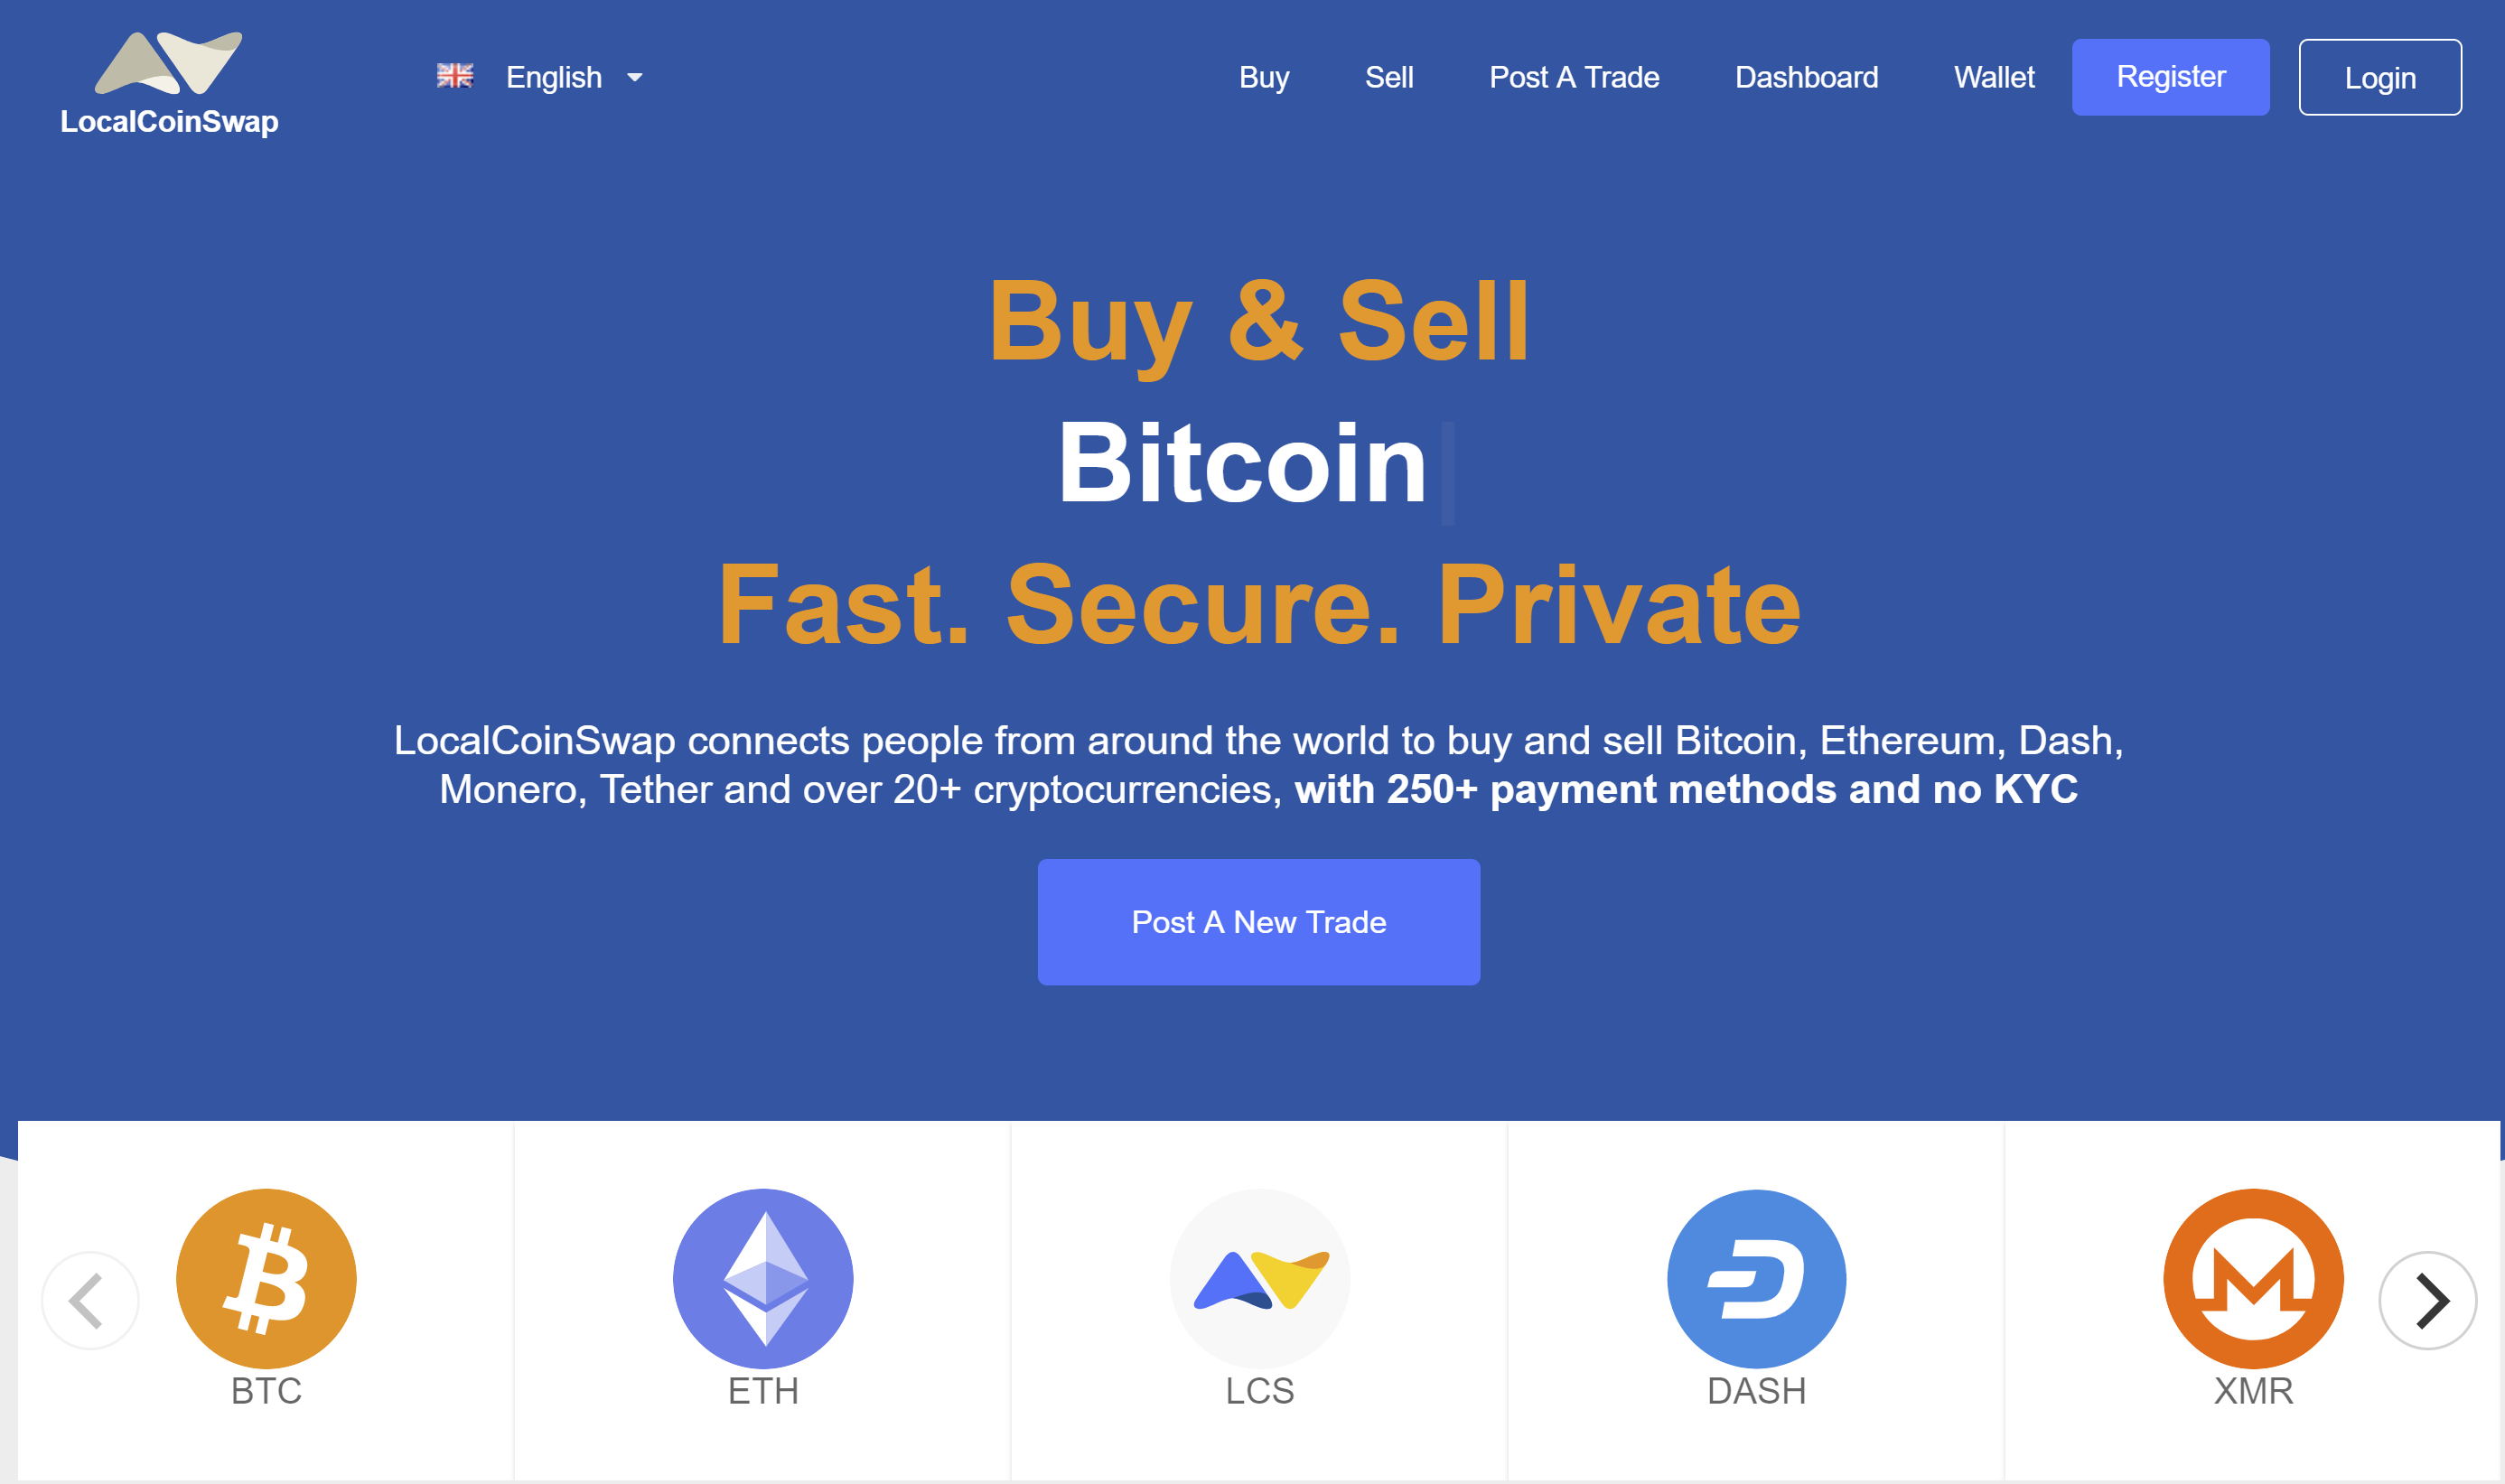 LocalCoinSwap homepage